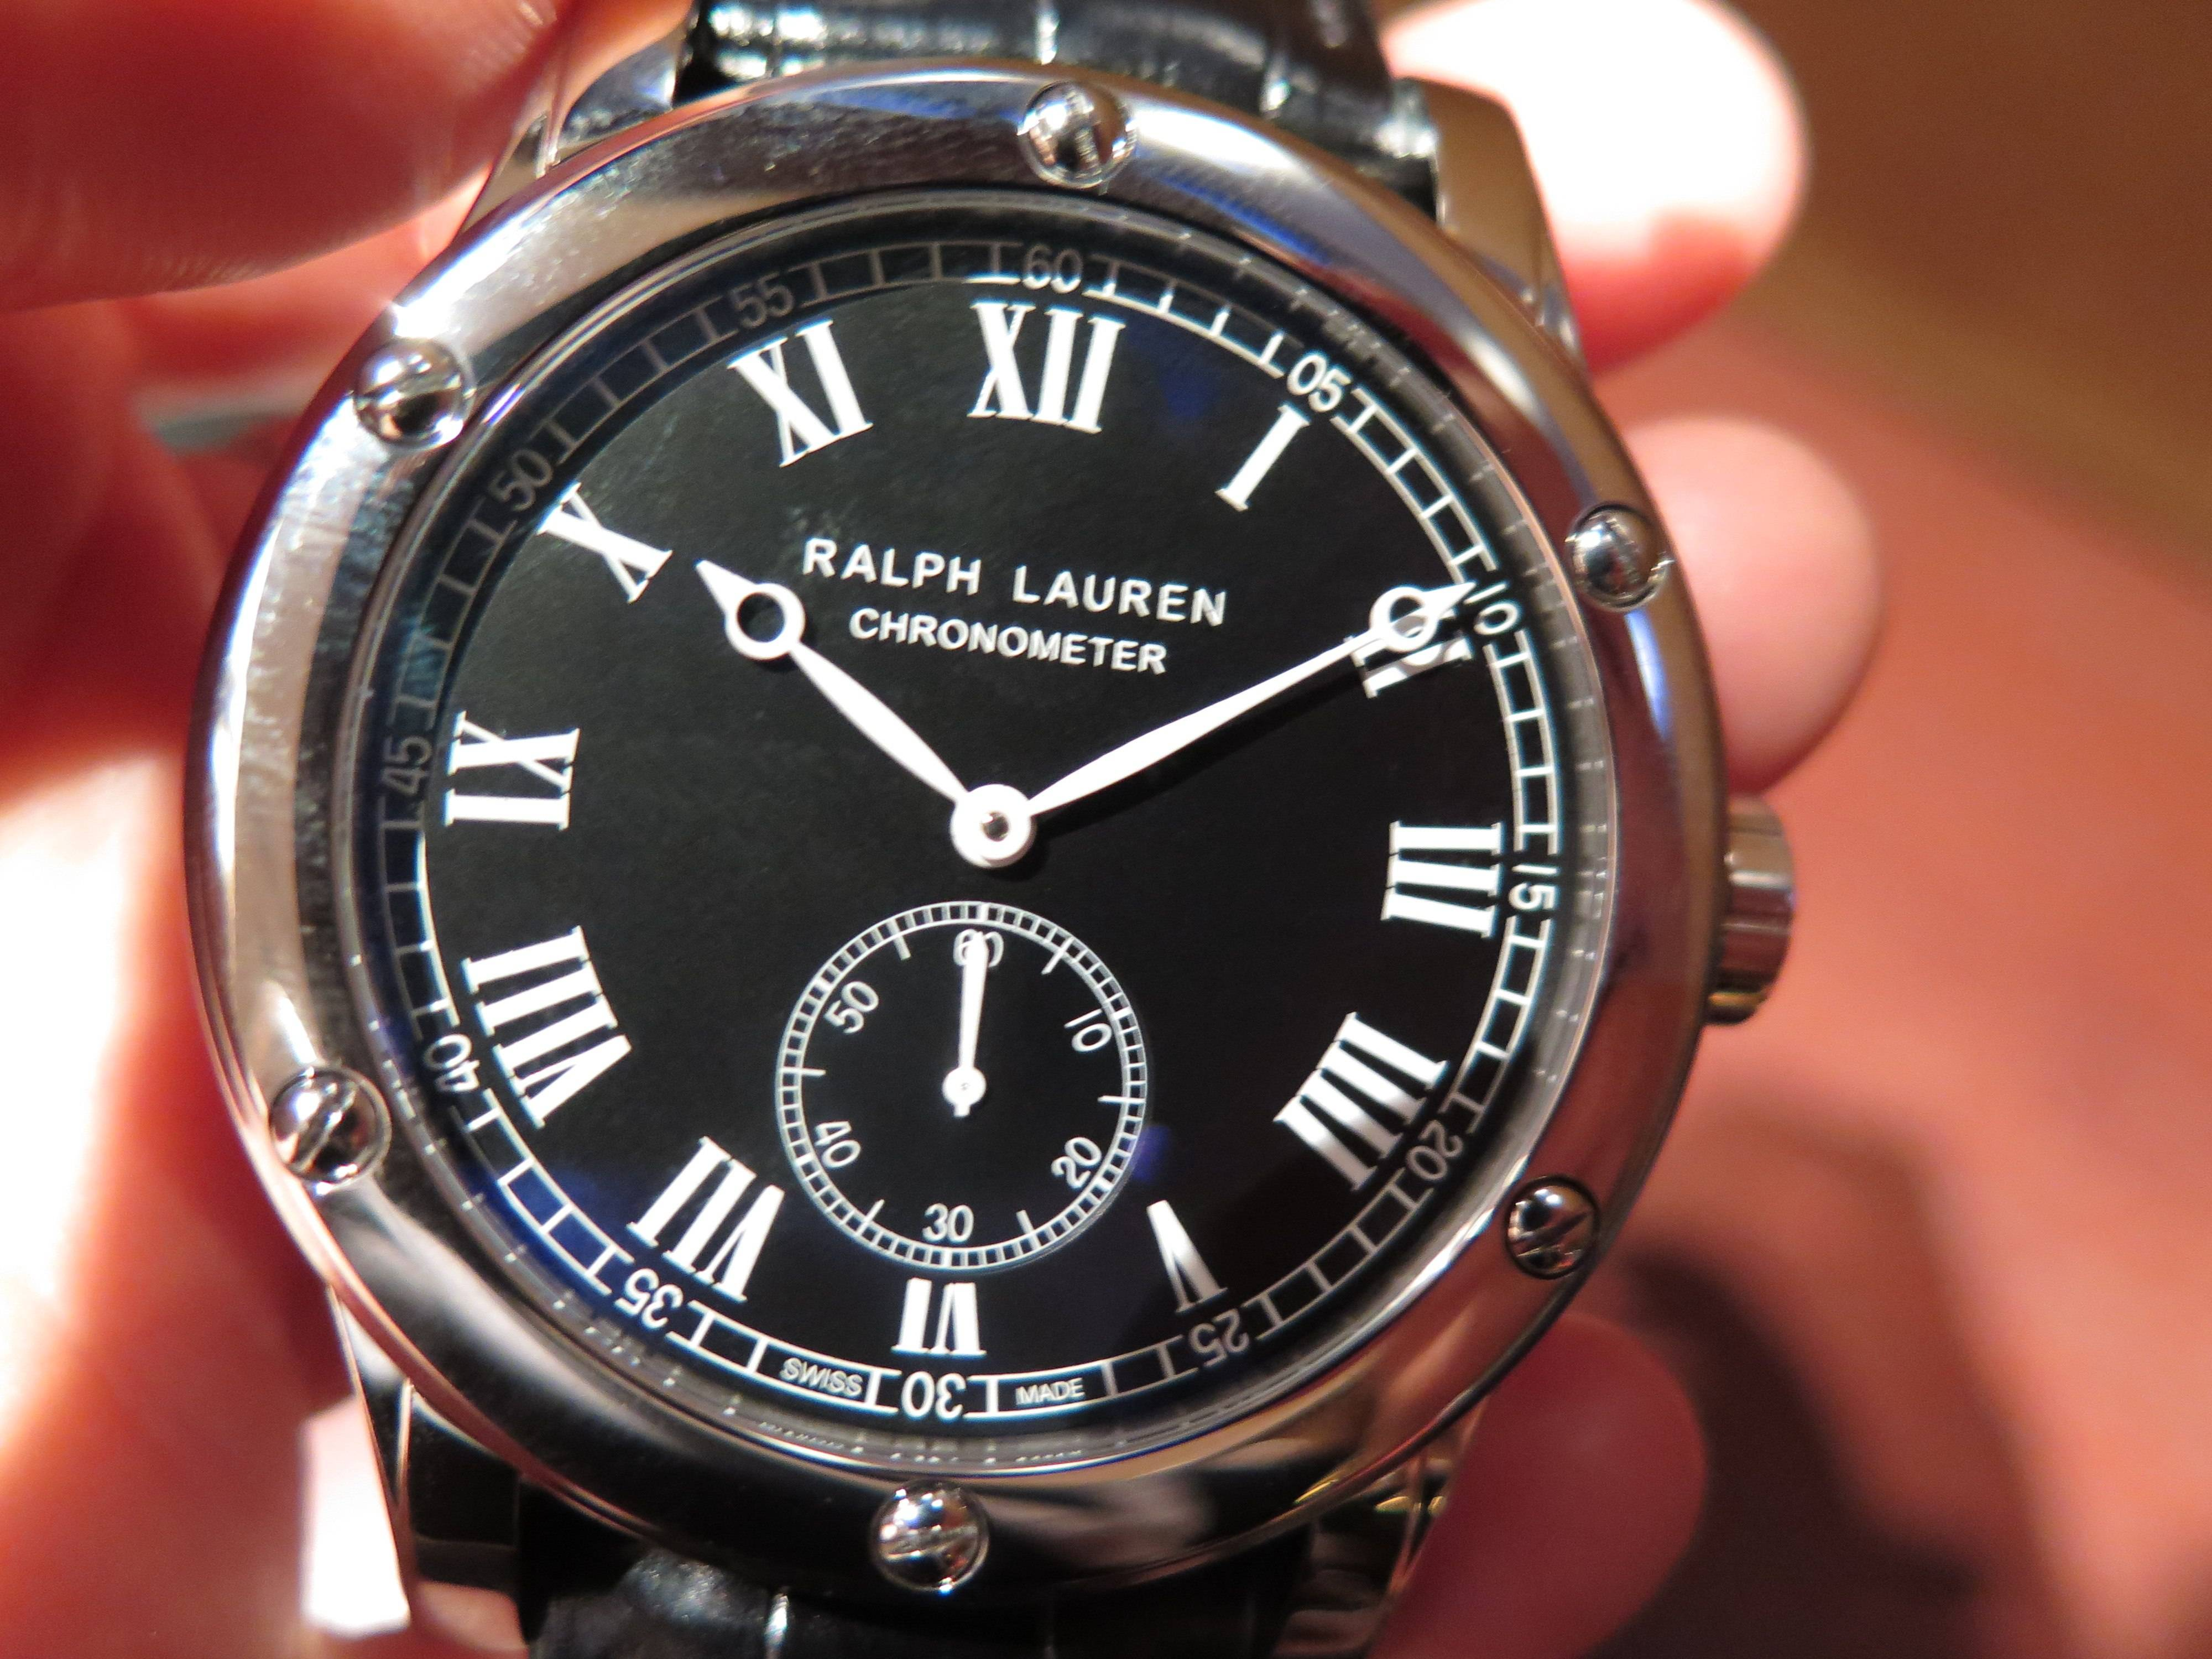 Ralph Lauren Classic Chronometer.